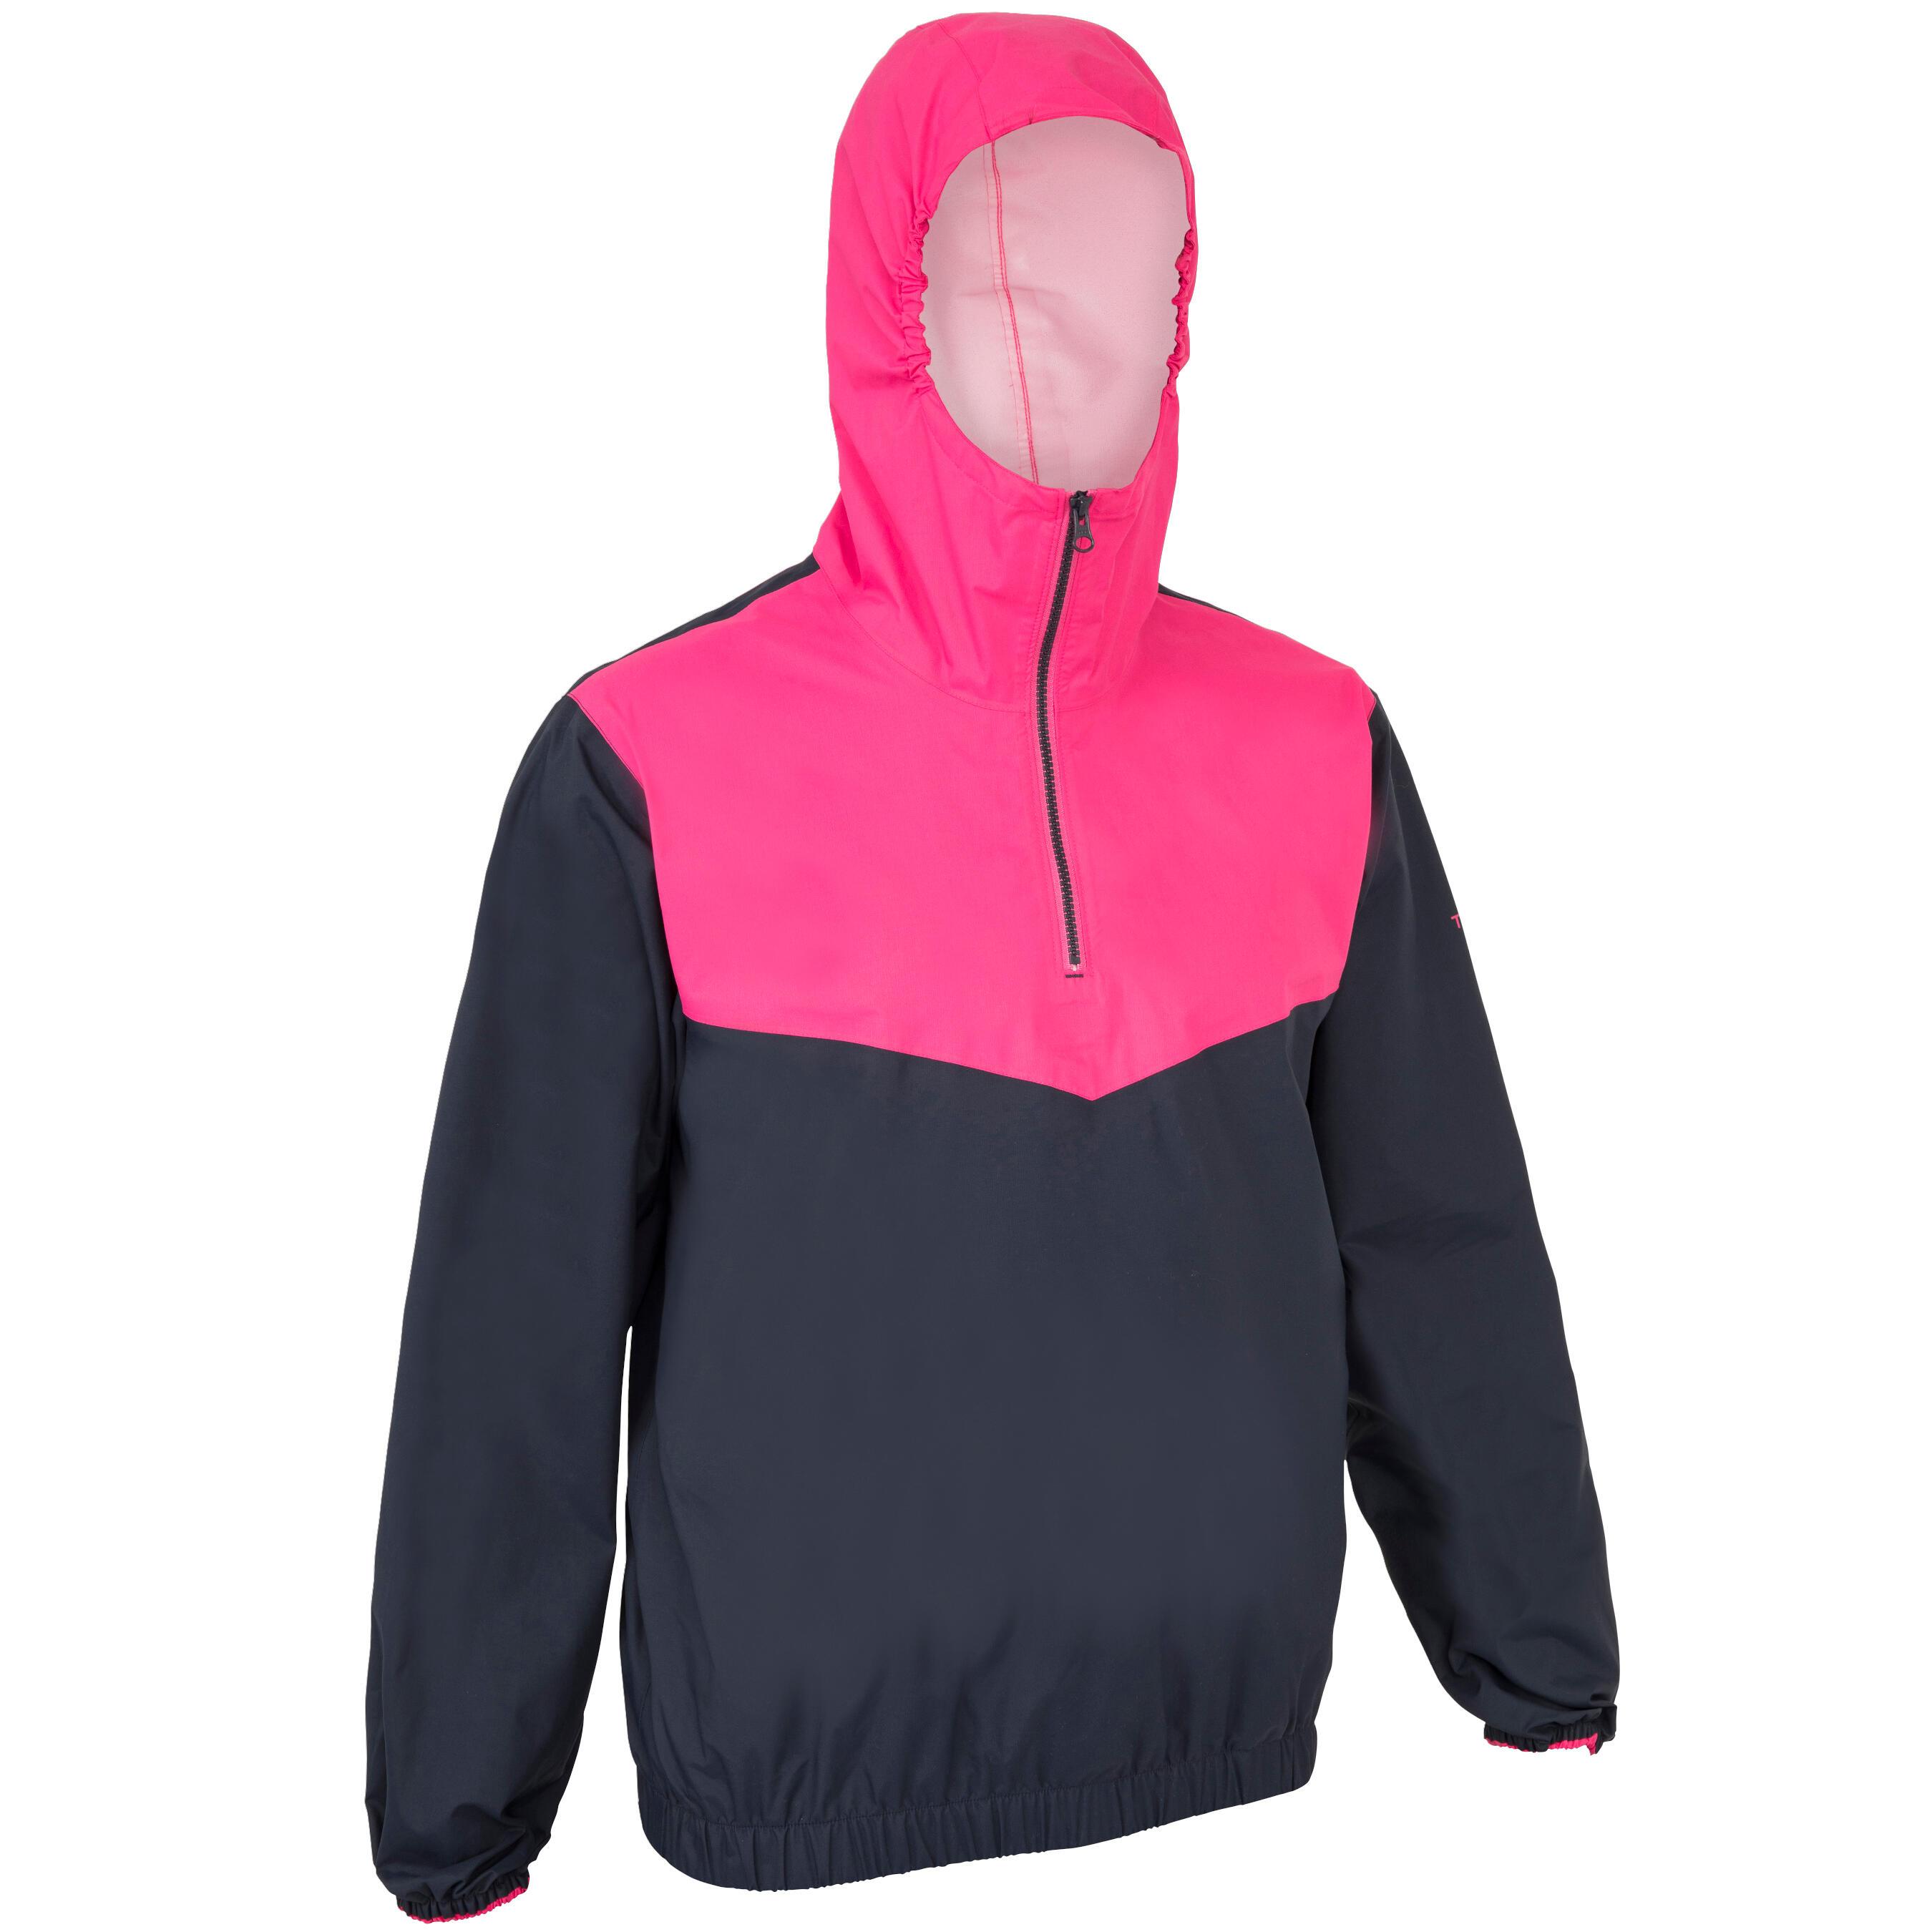 Tribord Spraytop voor sportzeilen volwassenen S100 donkerblauw/roze